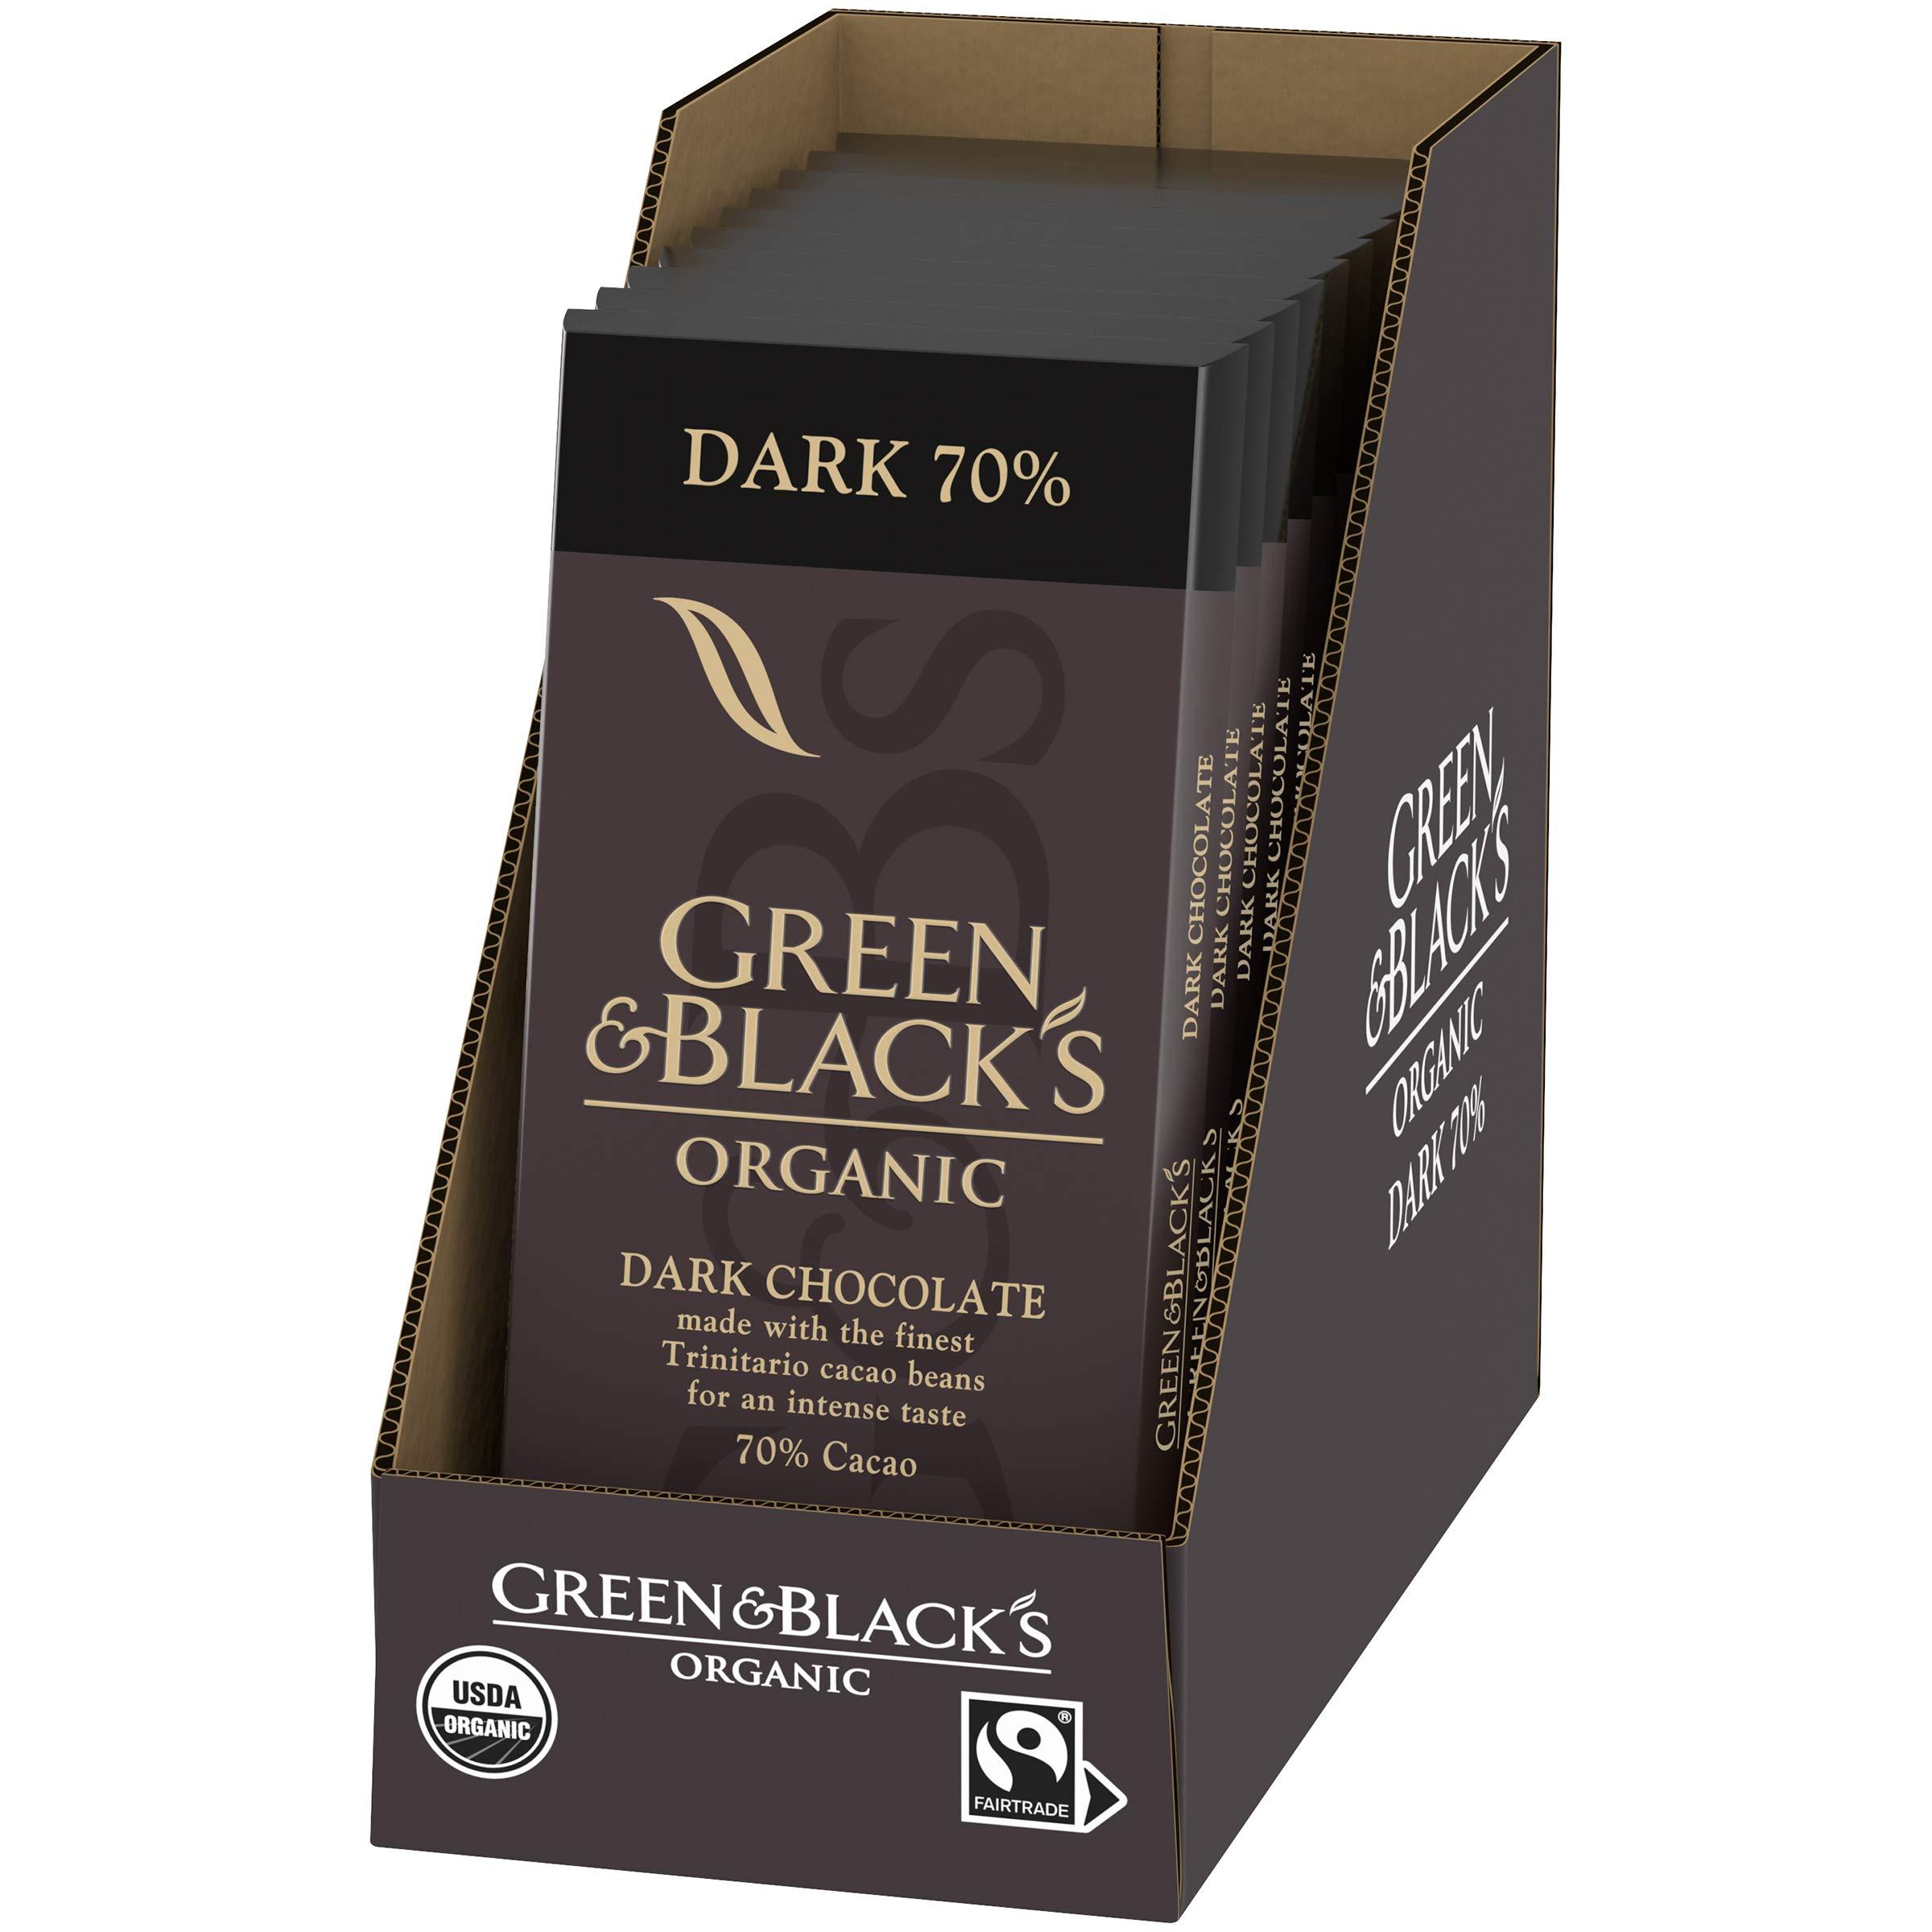 Green & Black's Organic Dark Chocolate 70% Cacao by Green & Black's